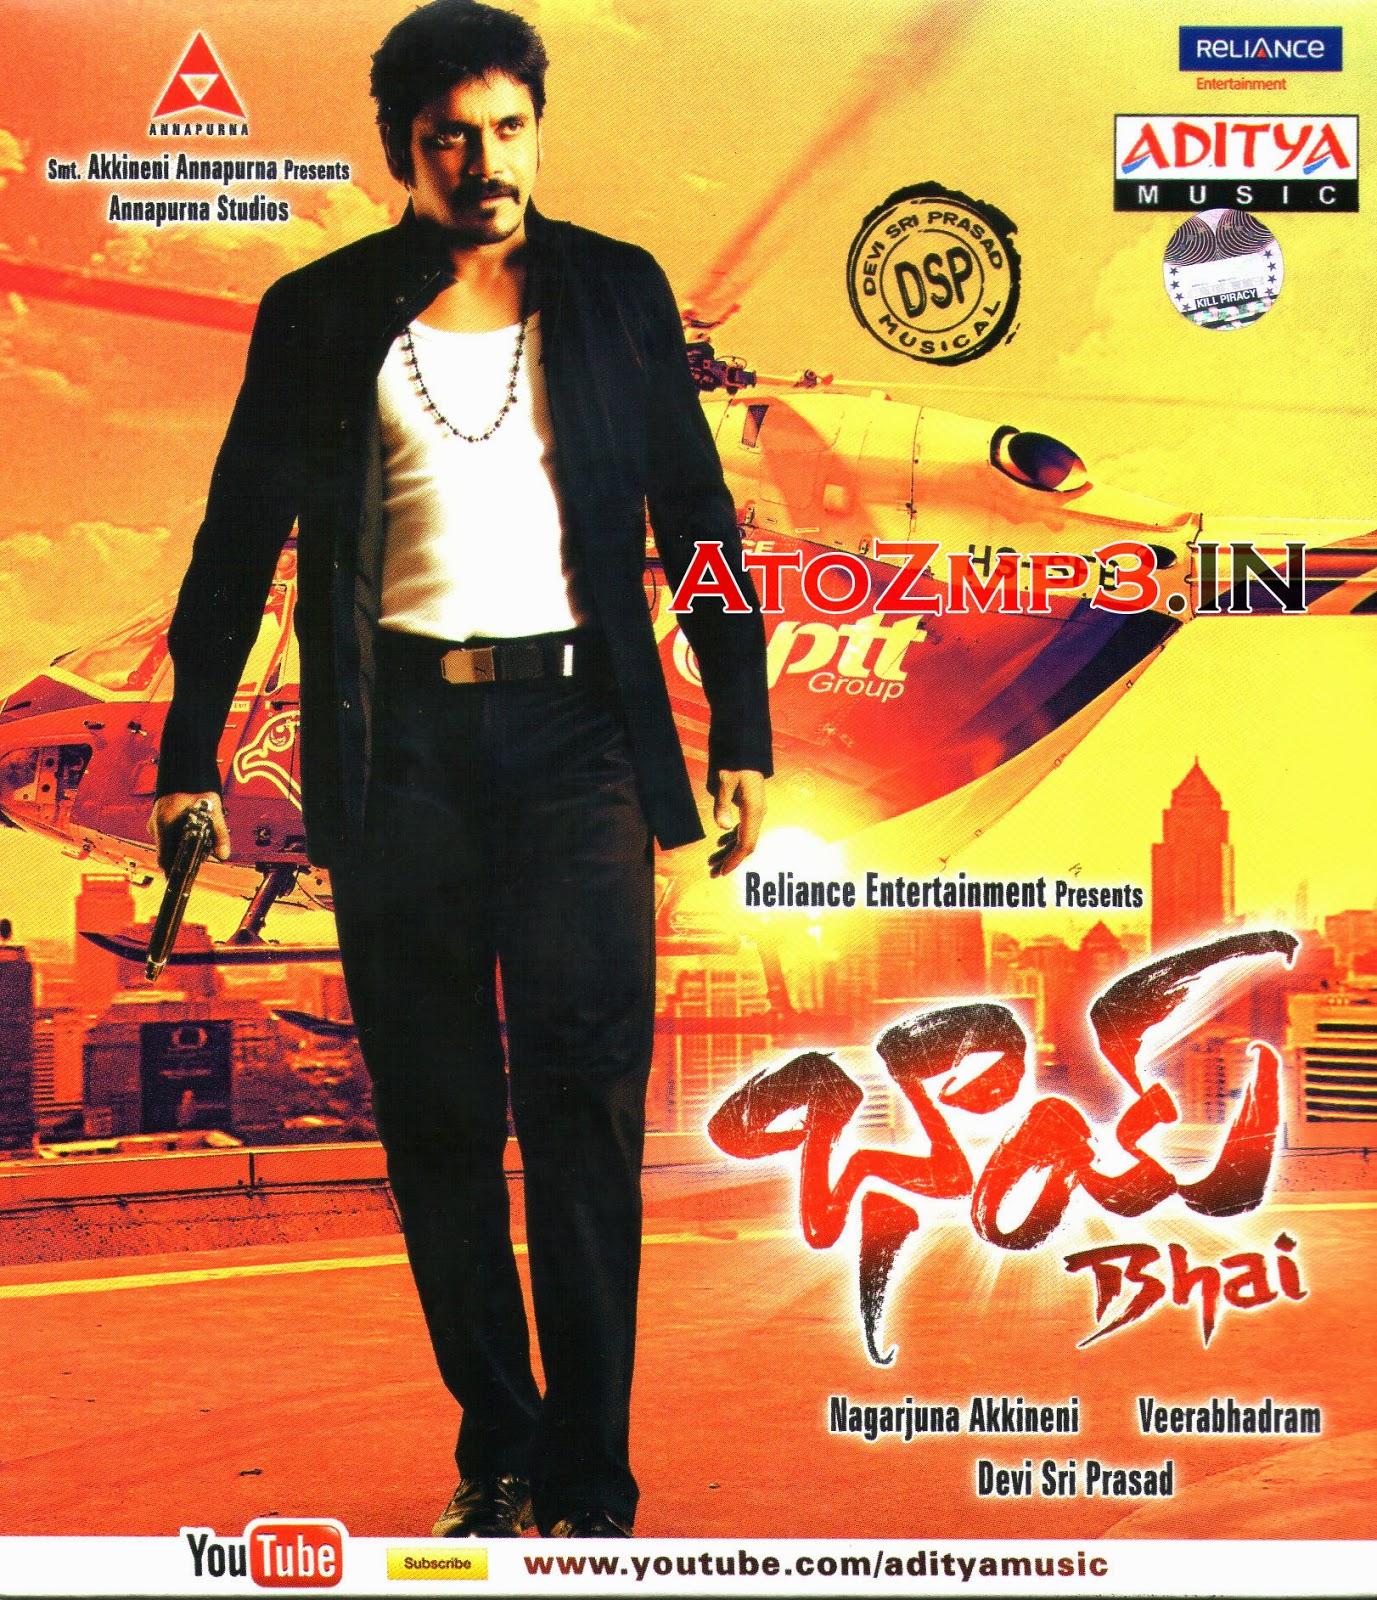 Bhai 2013: bhai telugu movie mp3 songs free download.